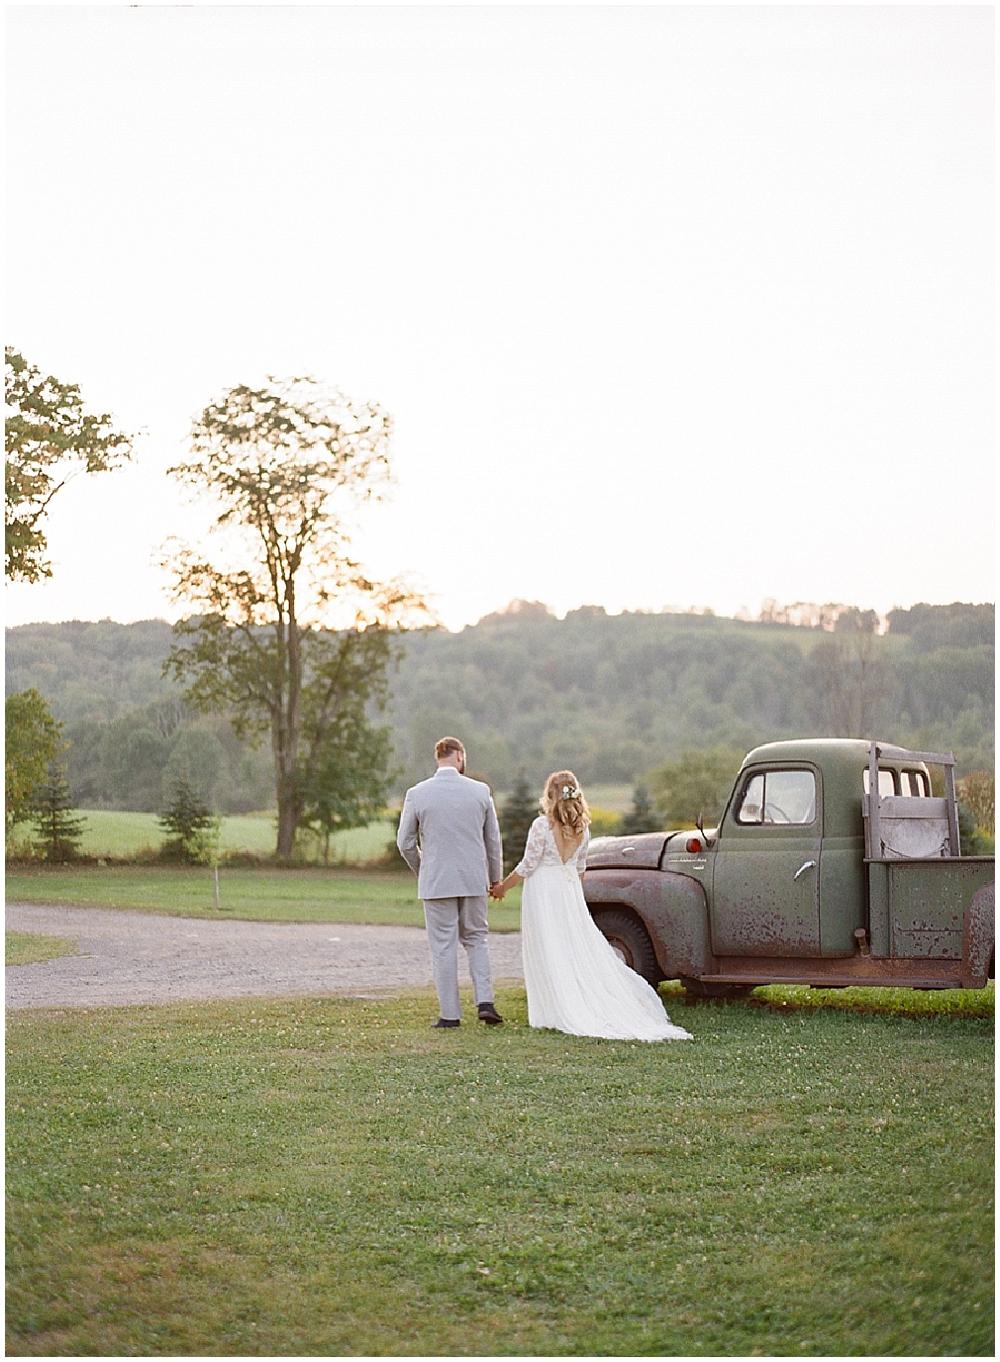 upstate-ny-farm-wedding-photographer-gilbertsville-farmhouse-22